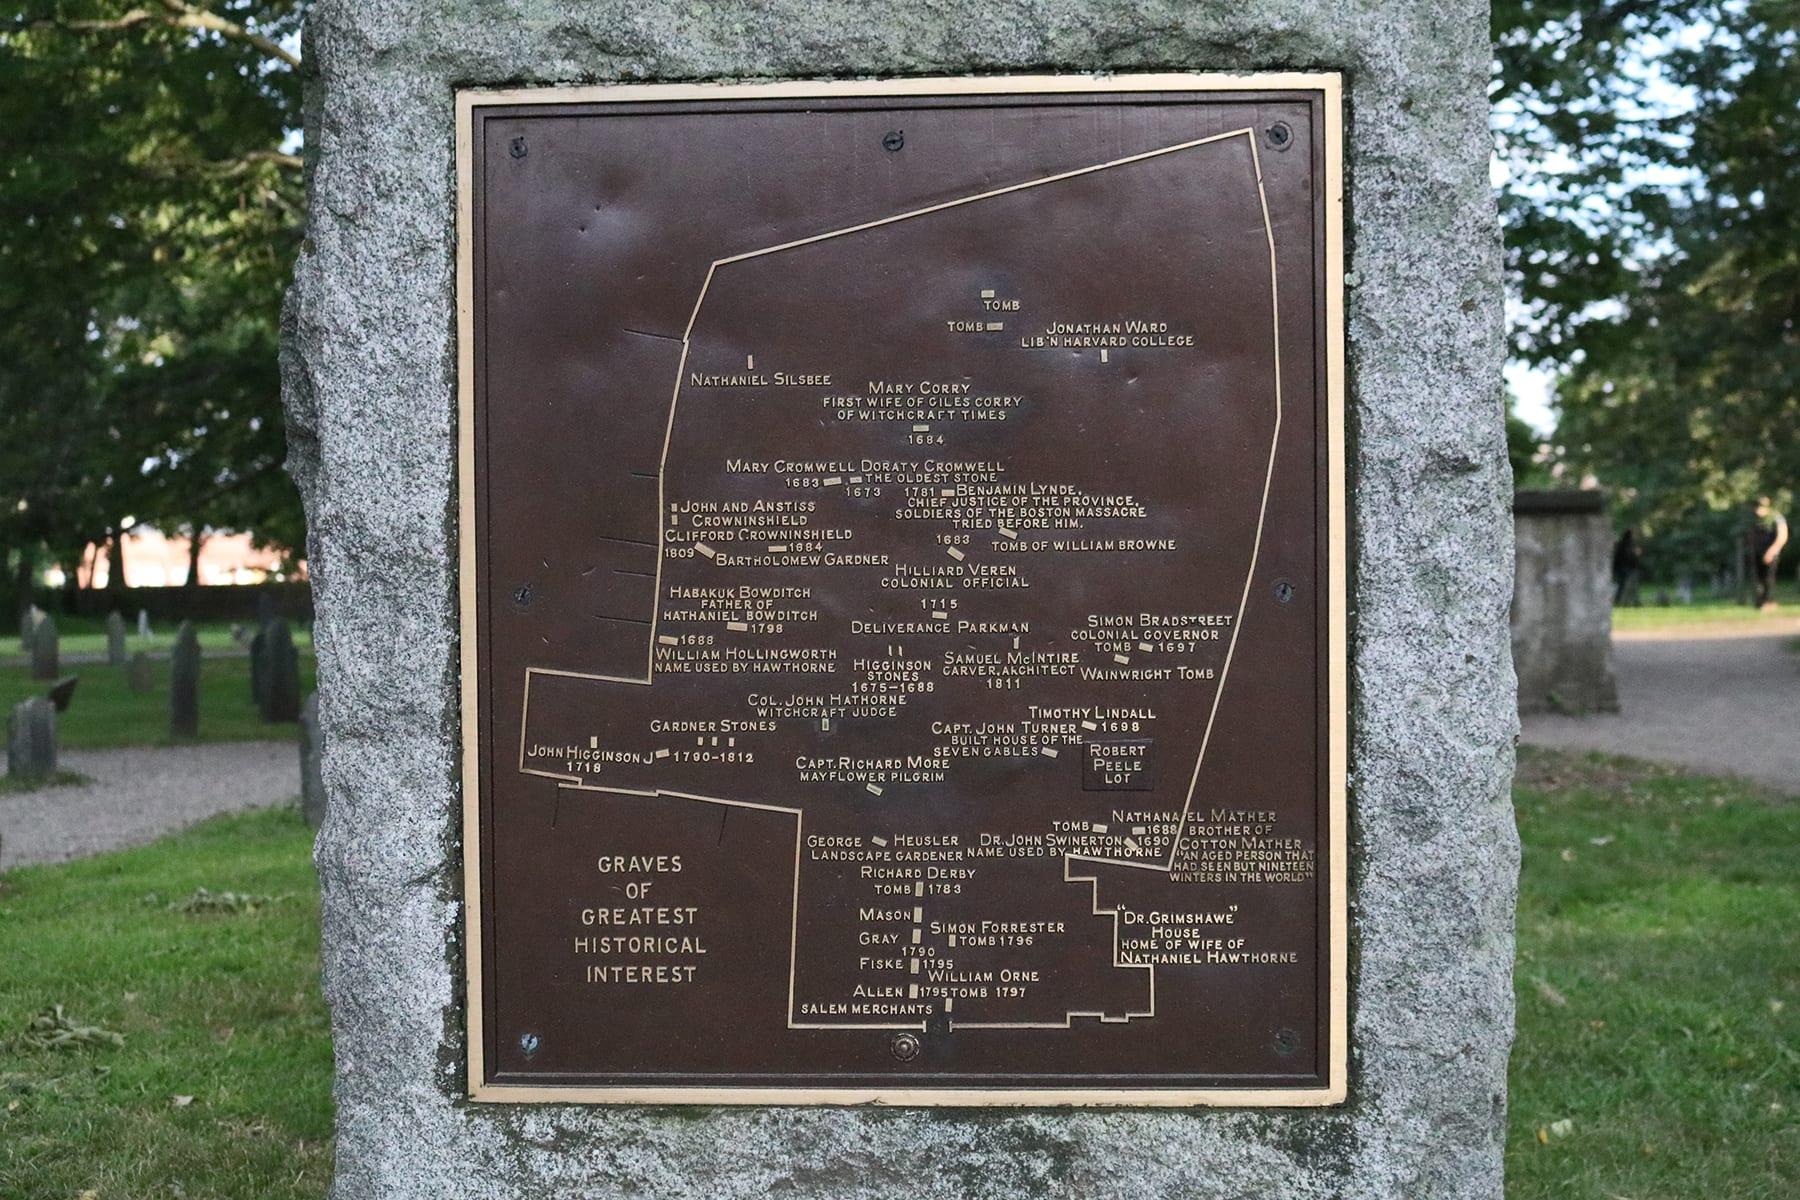 04-MA-journey00-gravesitemap.jpg